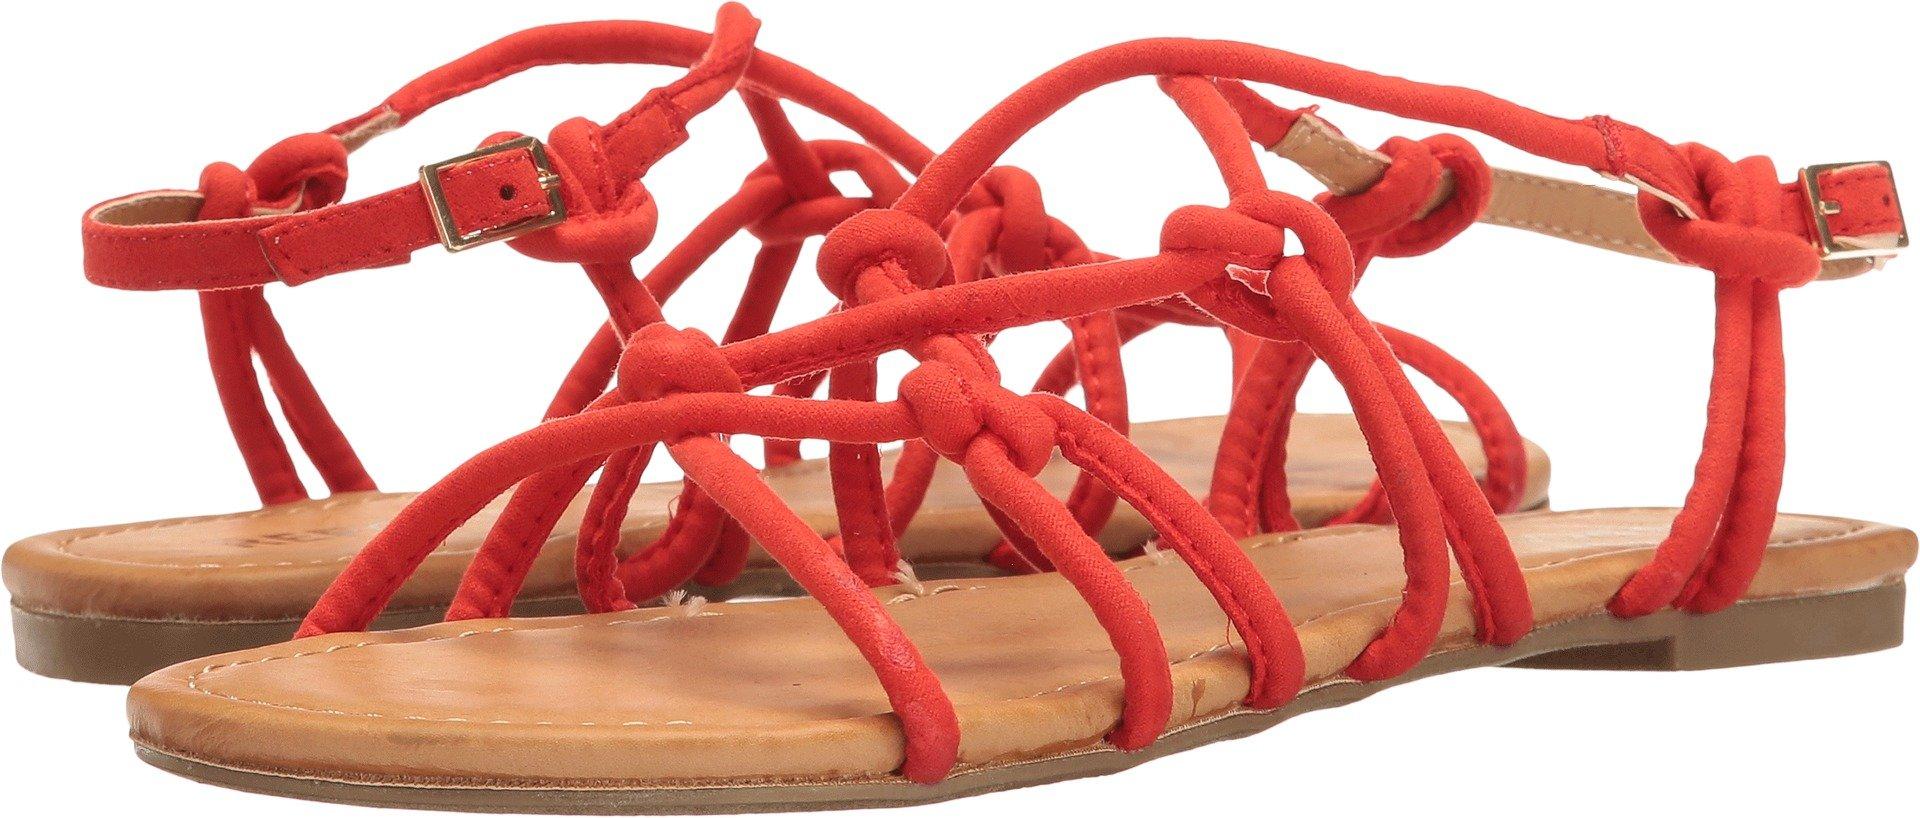 Report Genny Women's Sandal, Orange Synthetic, Size 6.0